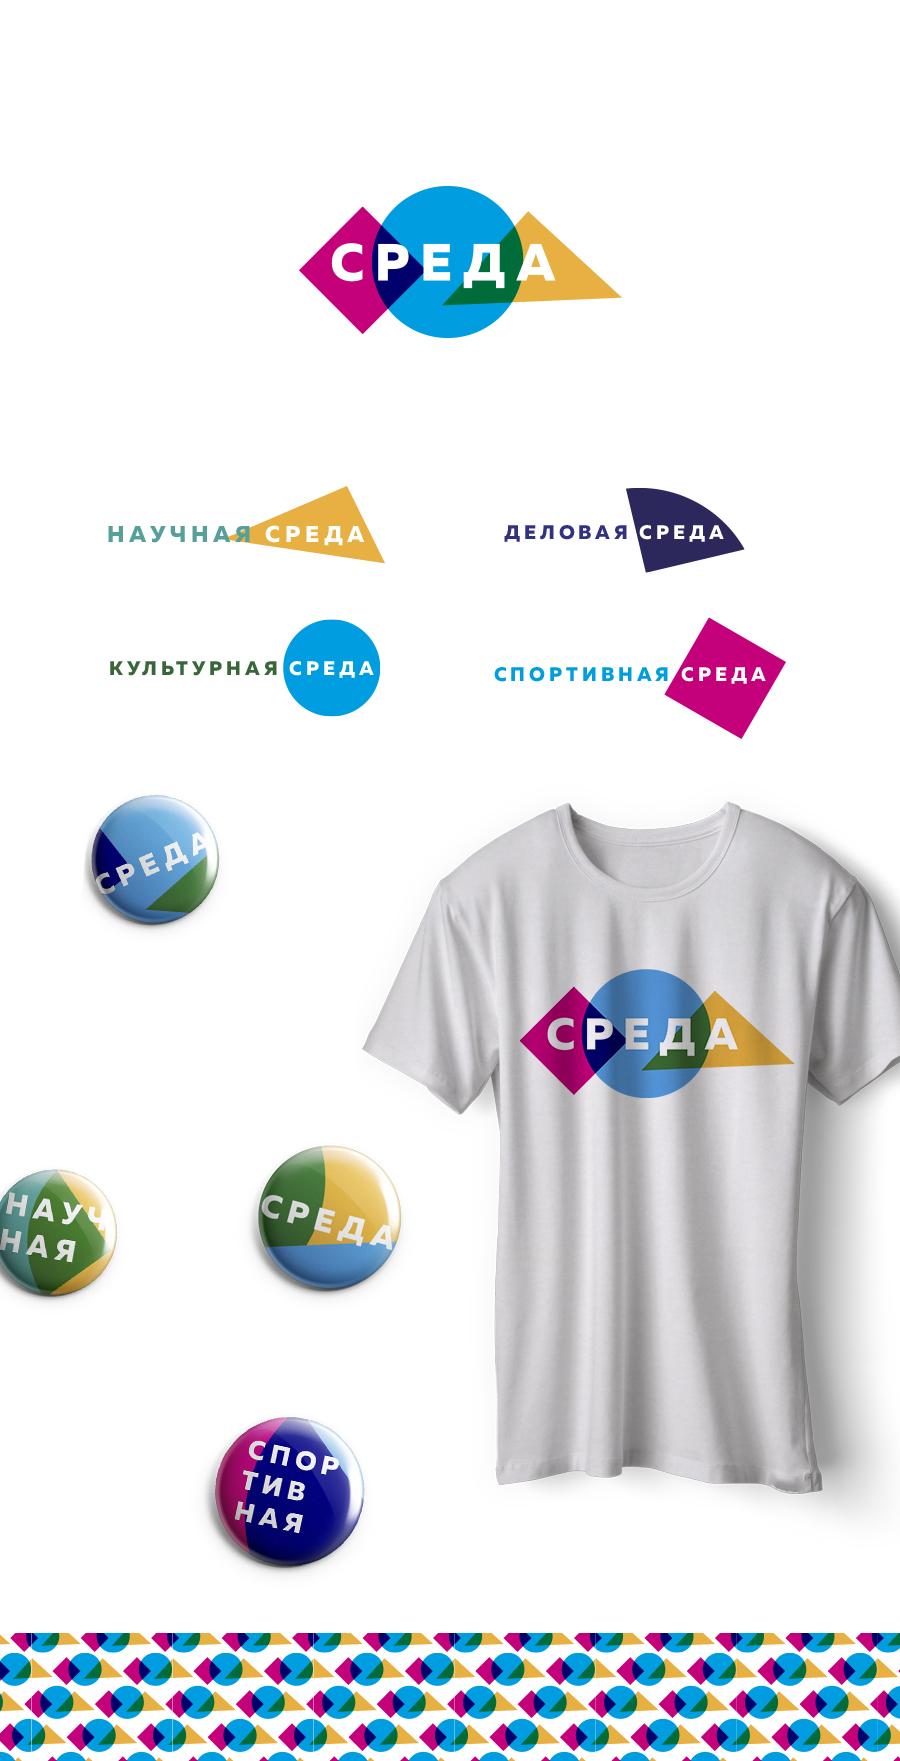 Разработка логотипа для творческого портала фото f_9485b45fa61243e6.jpg